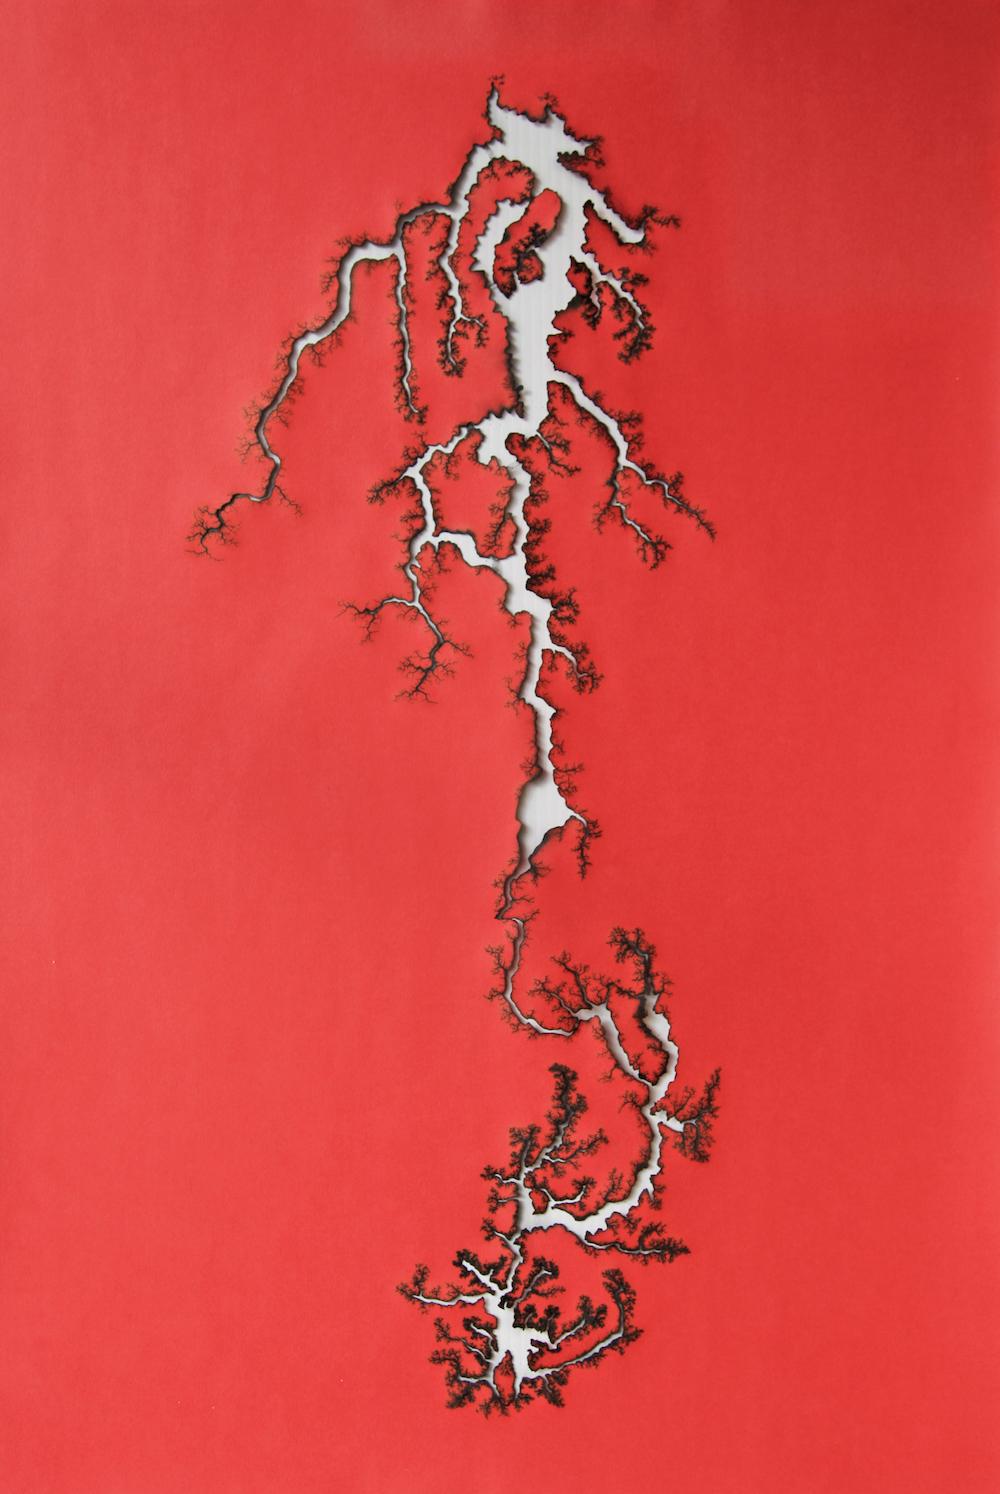 'Path of Least Resistance', 2014   Troika (Conny Freyer, Eva Rucki, Sebastien Noel)